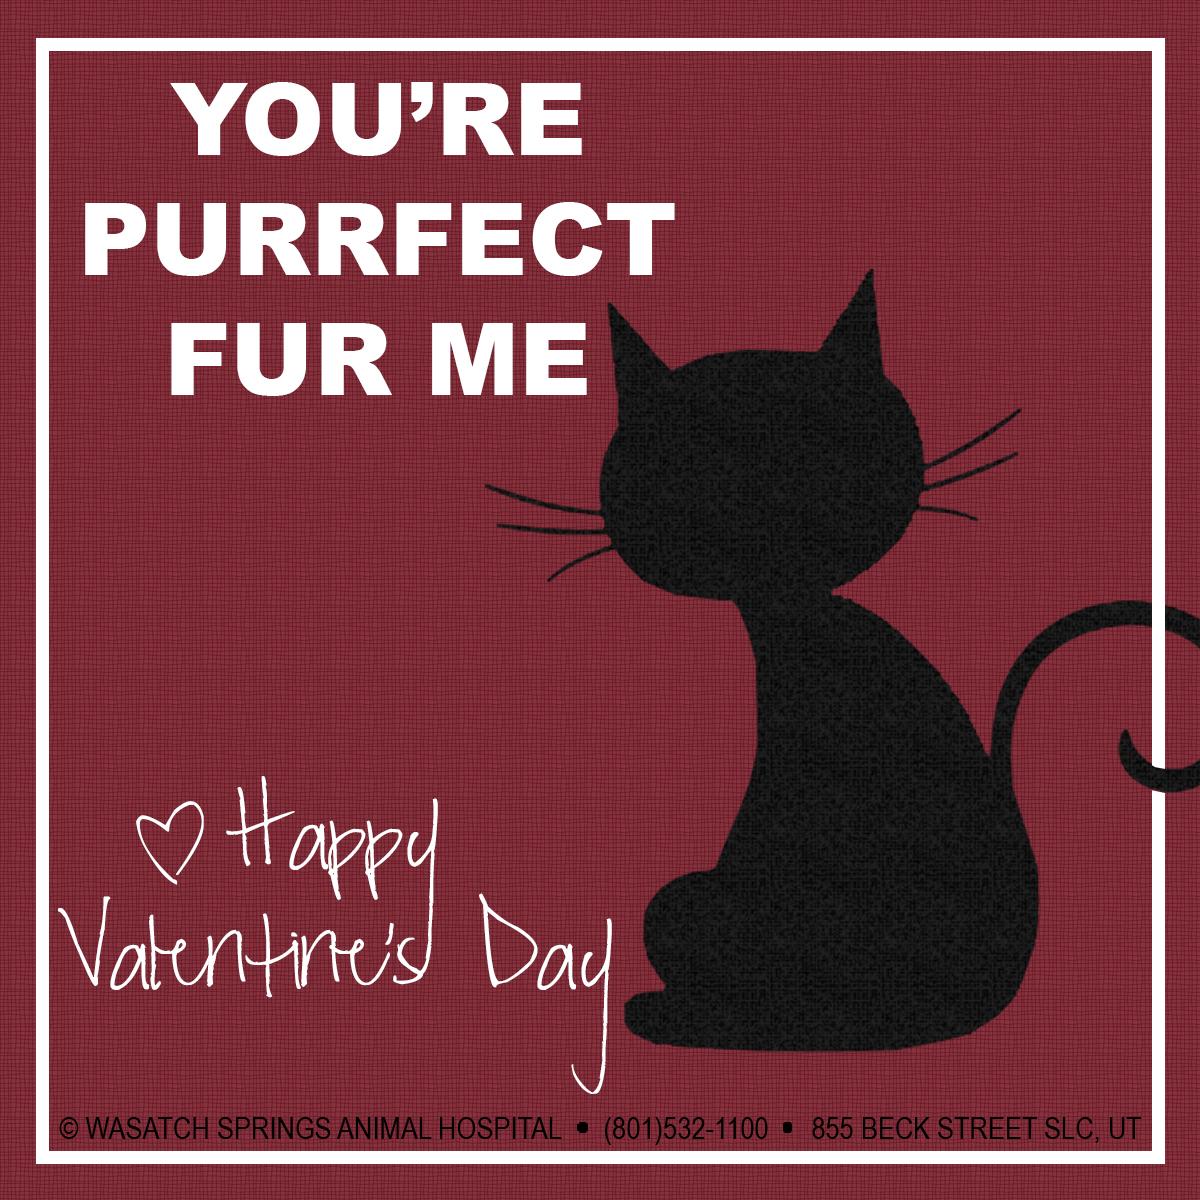 Valentines2015-WSAH-cat1.jpg